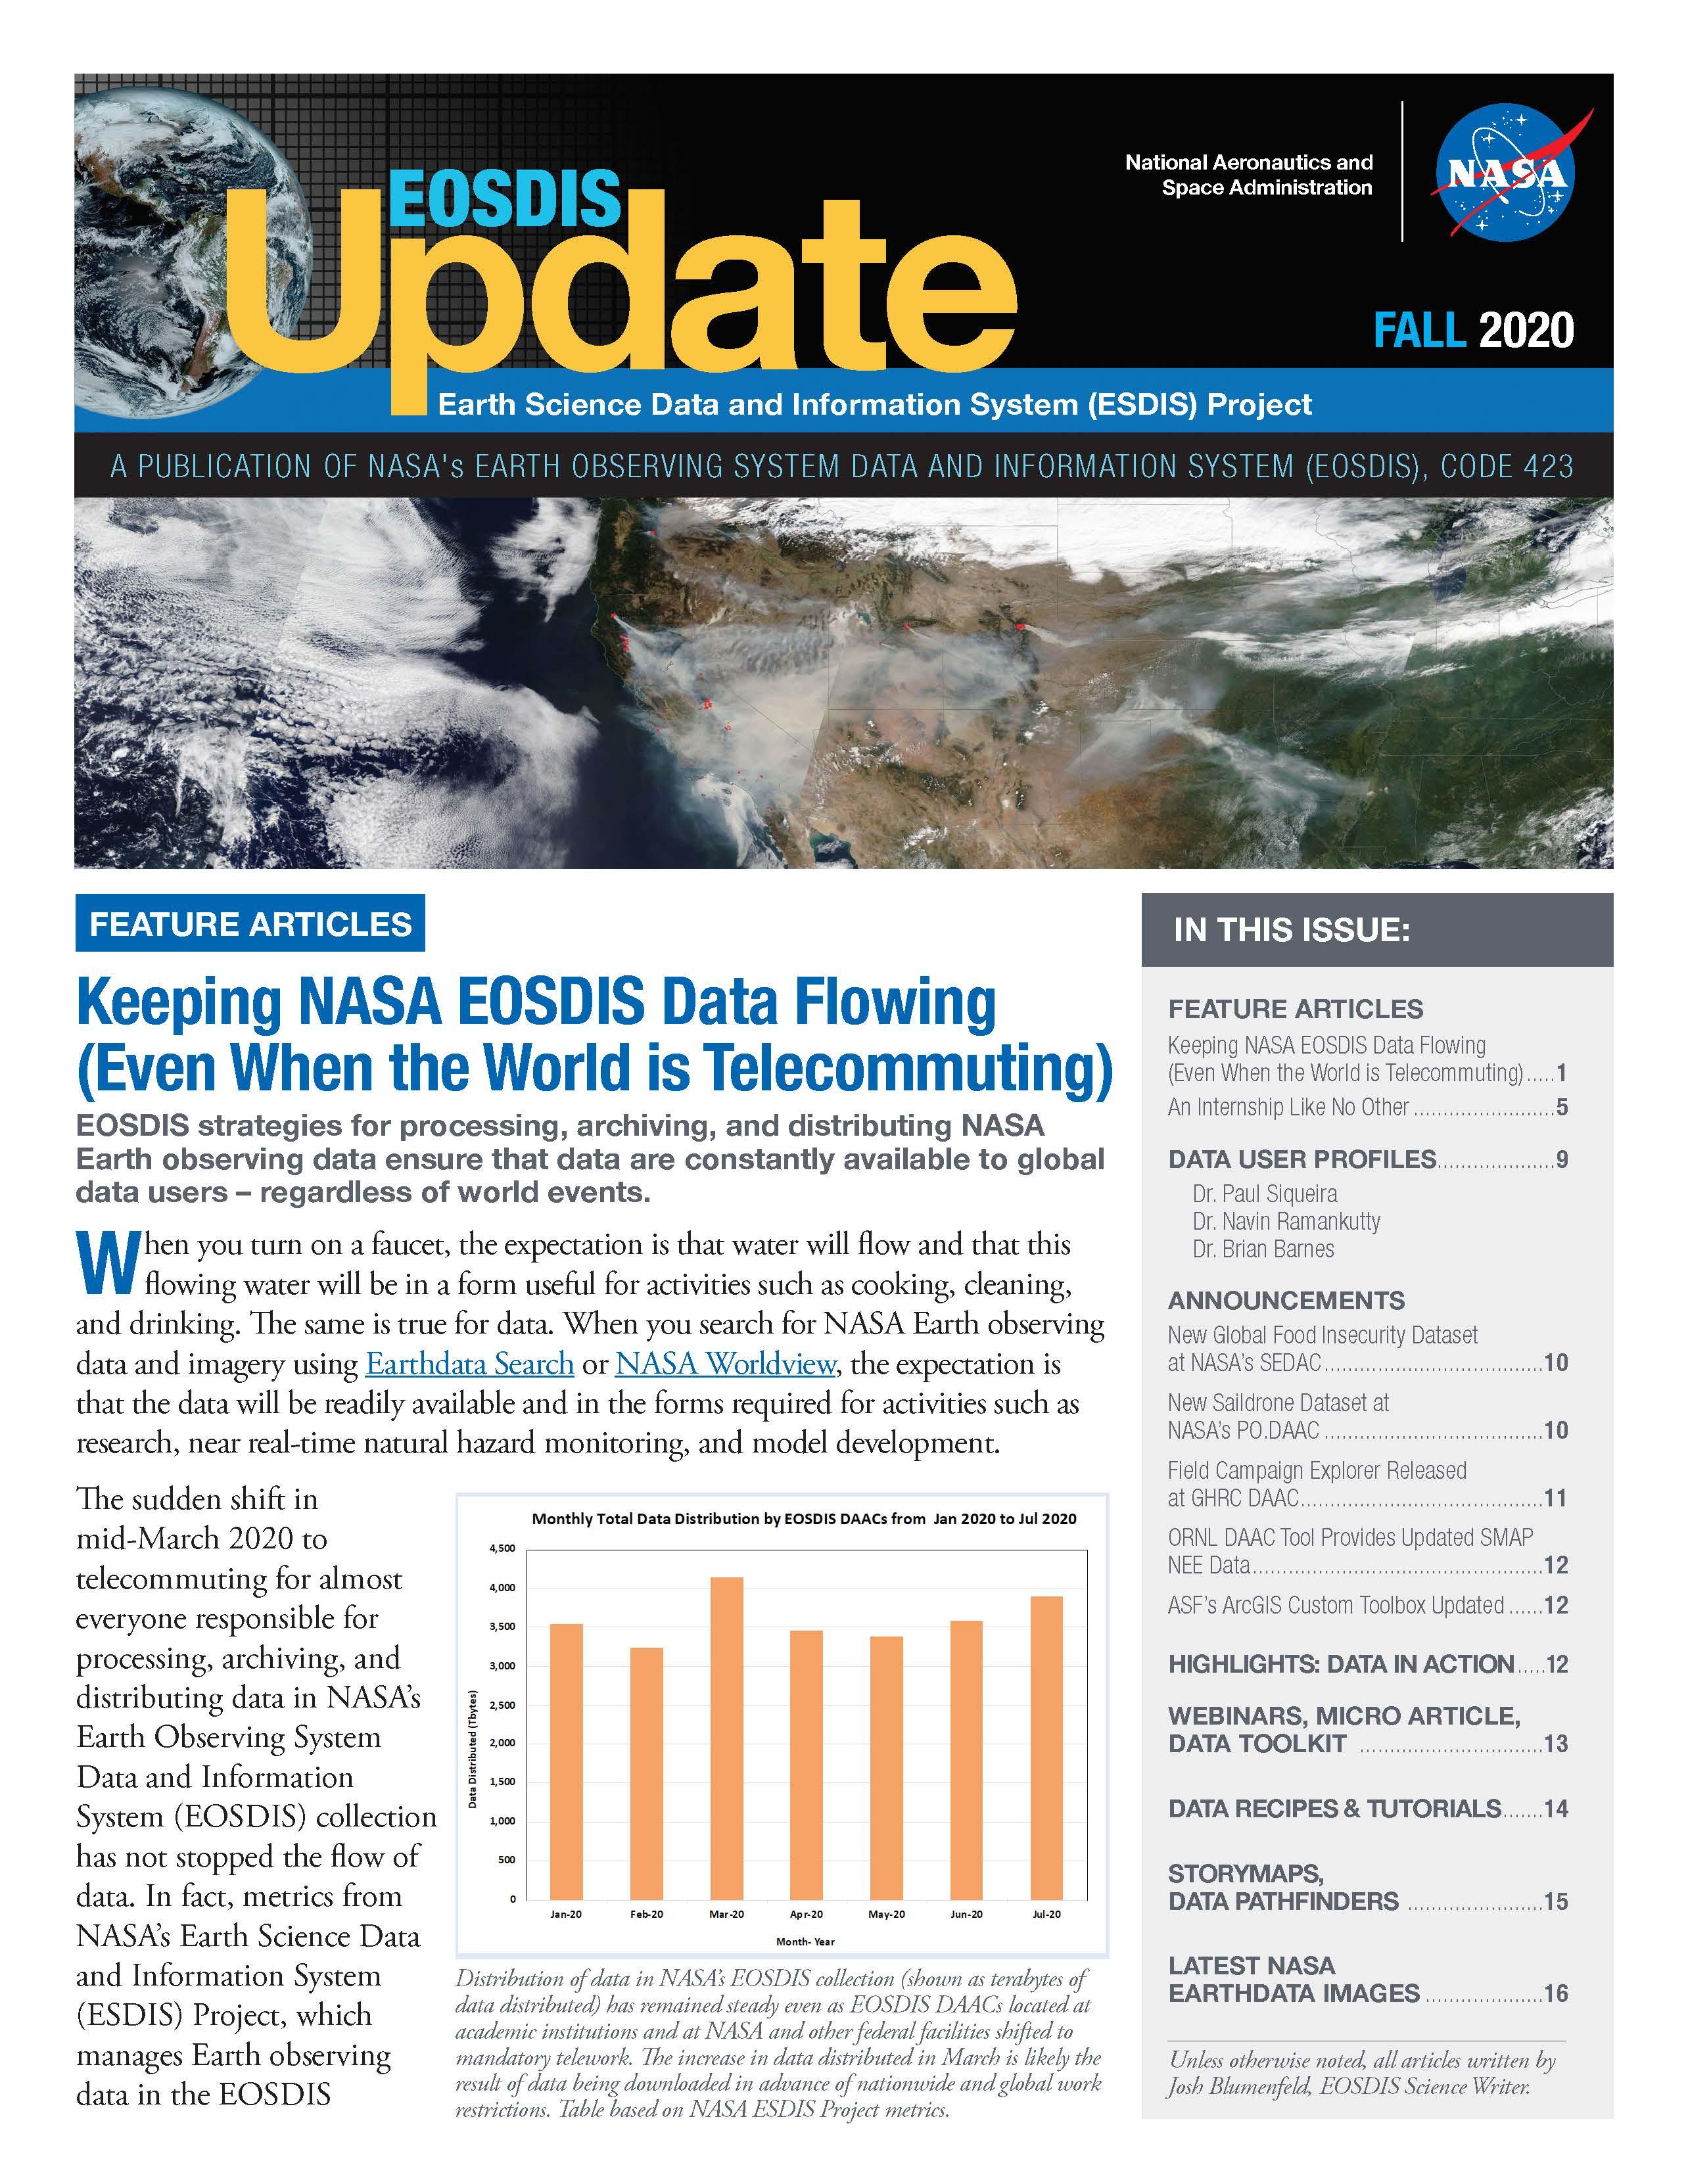 EOSDIS Quarterly Update- Fall 2020Newsletter Cover Image